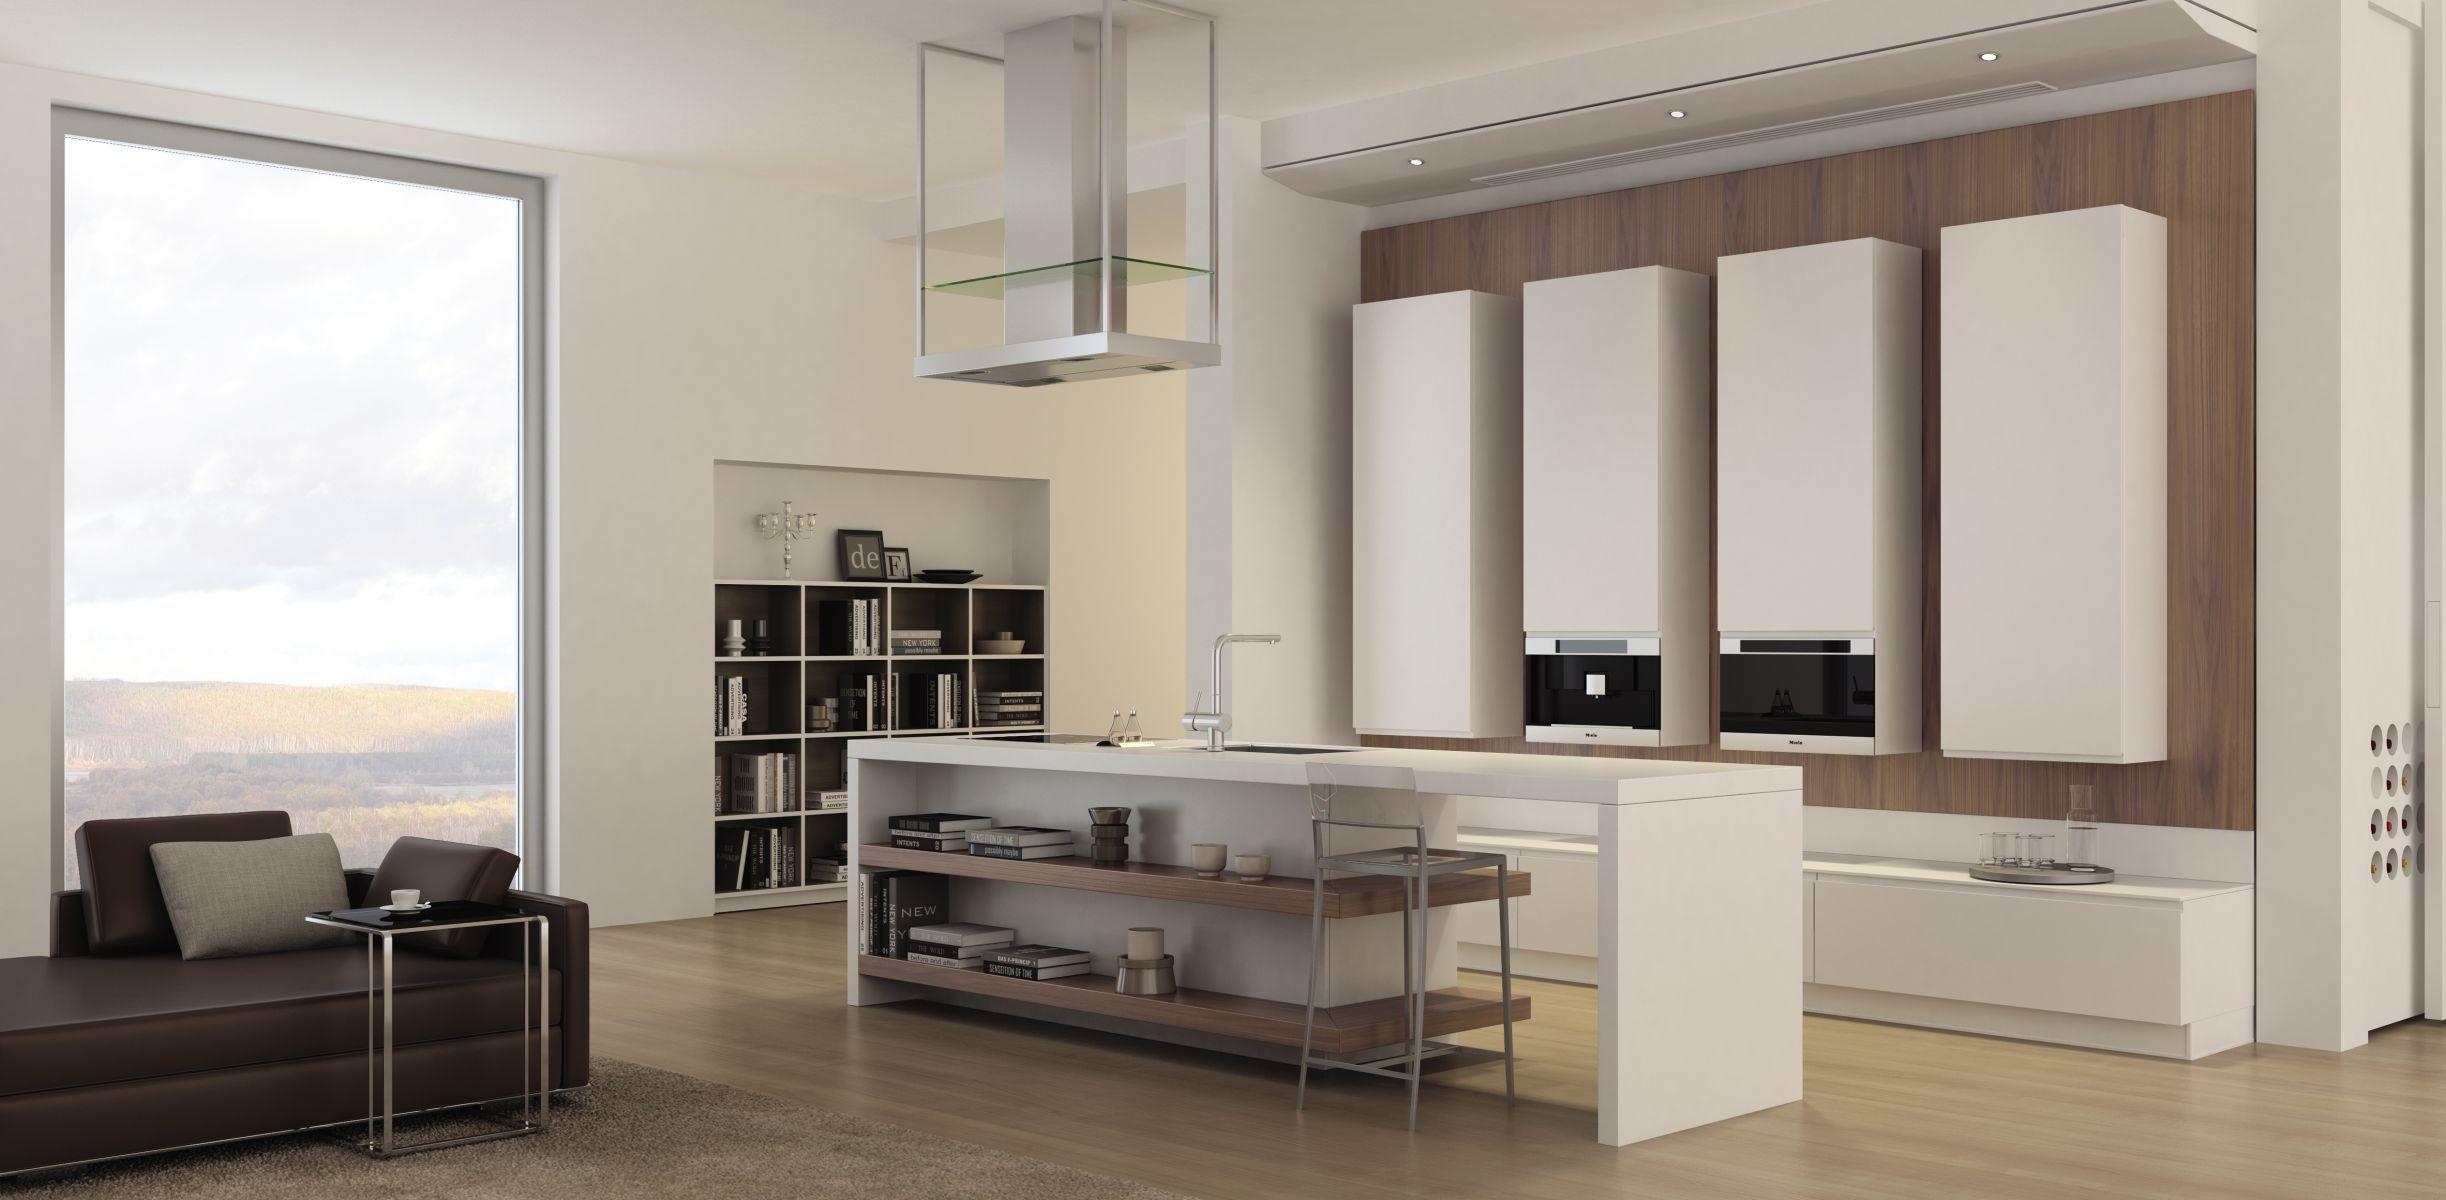 Кухня-гостиная в стиле «минимализм» (32 фото): дизайн ...